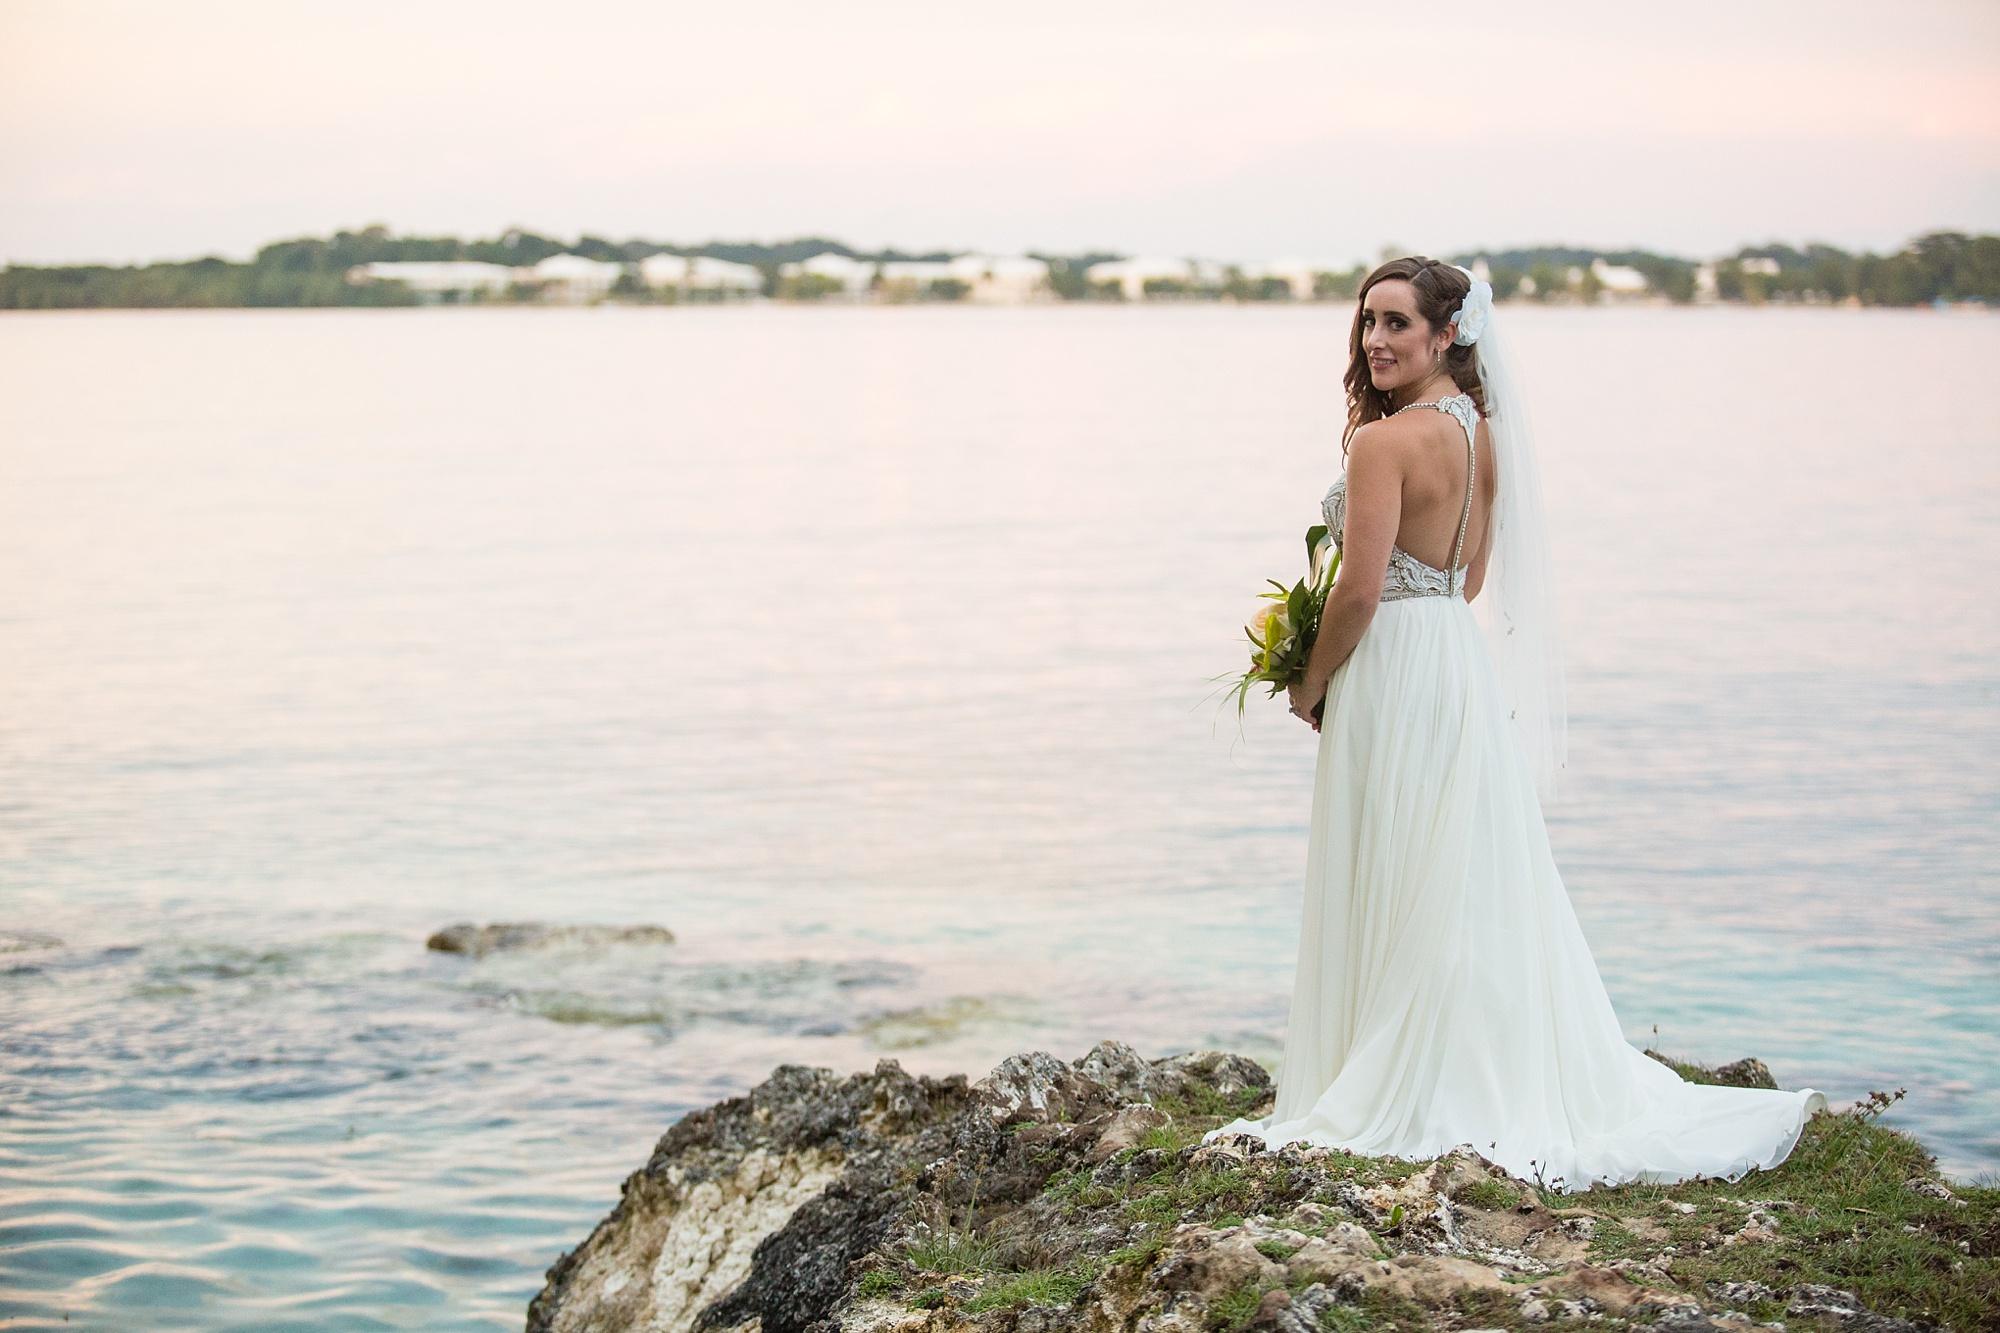 Brandon_Shafer_Photography_Scott_Marisa_Negril_Jamaica_Destination_Wedding_Photography_0047.jpg